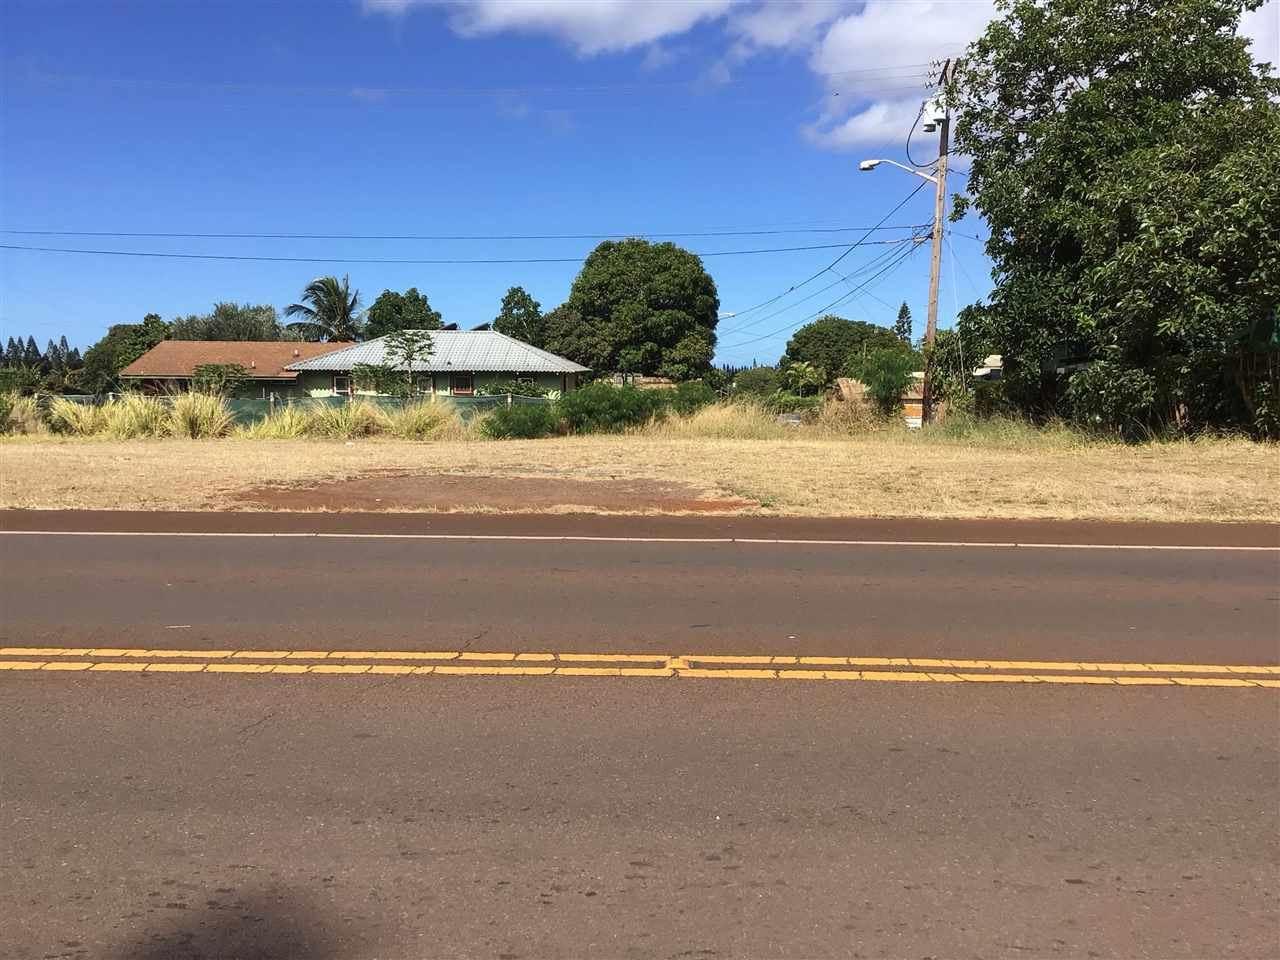 Photo of 0 Farrington Ave, Hoolehua, HI 96729 (MLS # 392206)